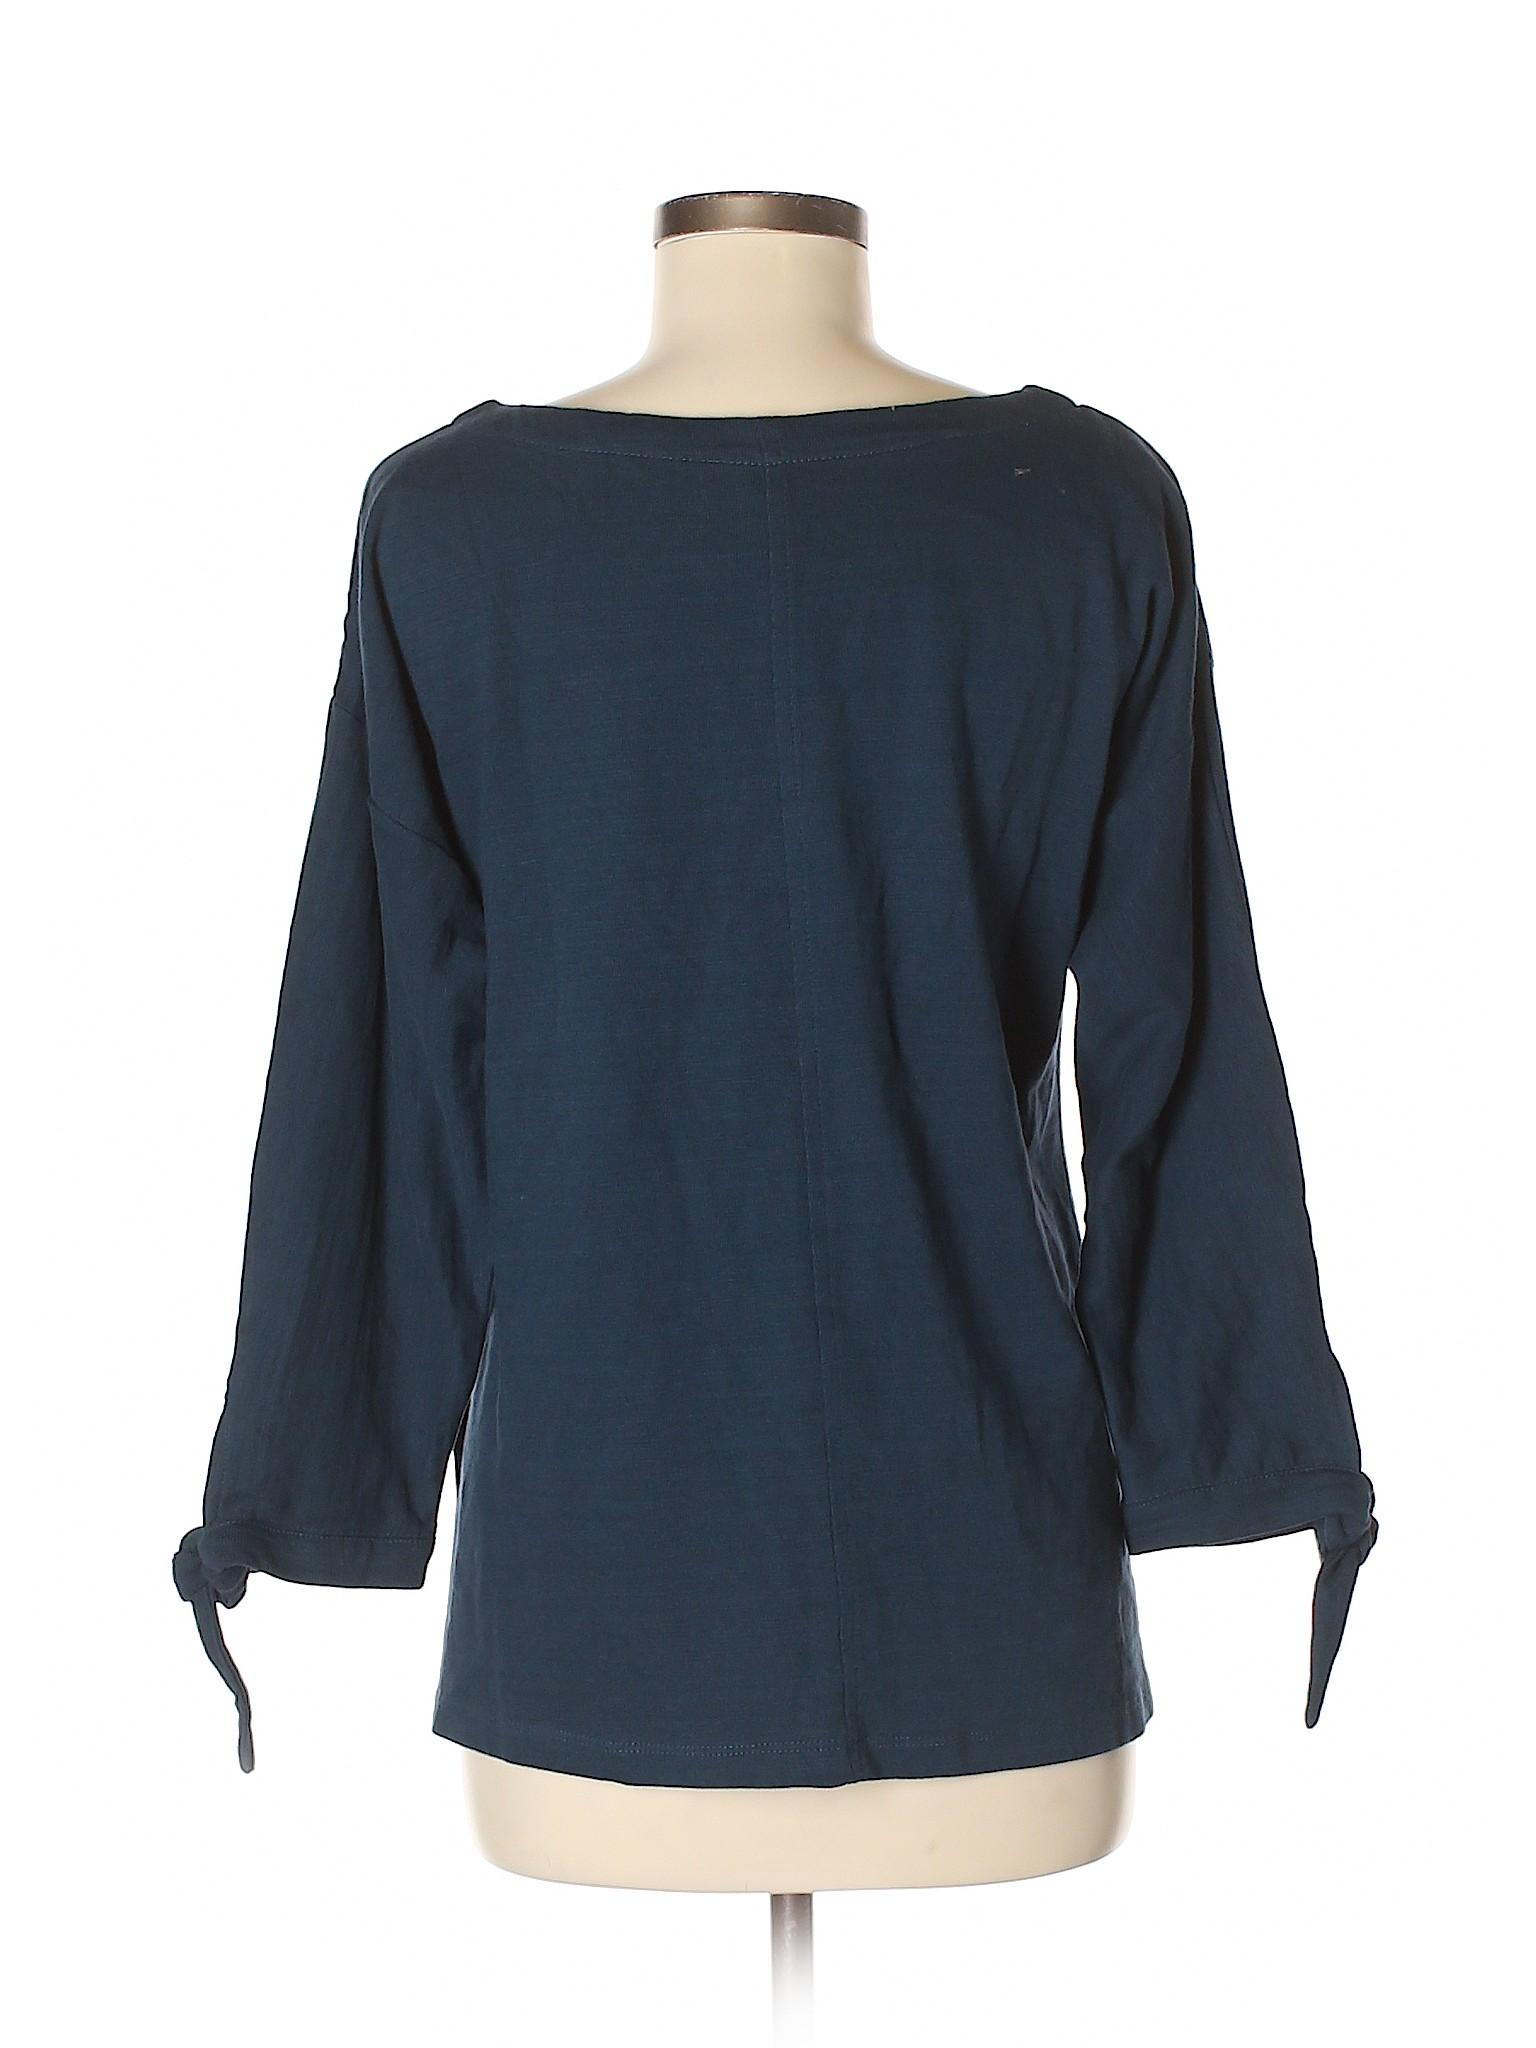 Sweater Taylor Ann Pullover Boutique winter LOFT EqwCWHX